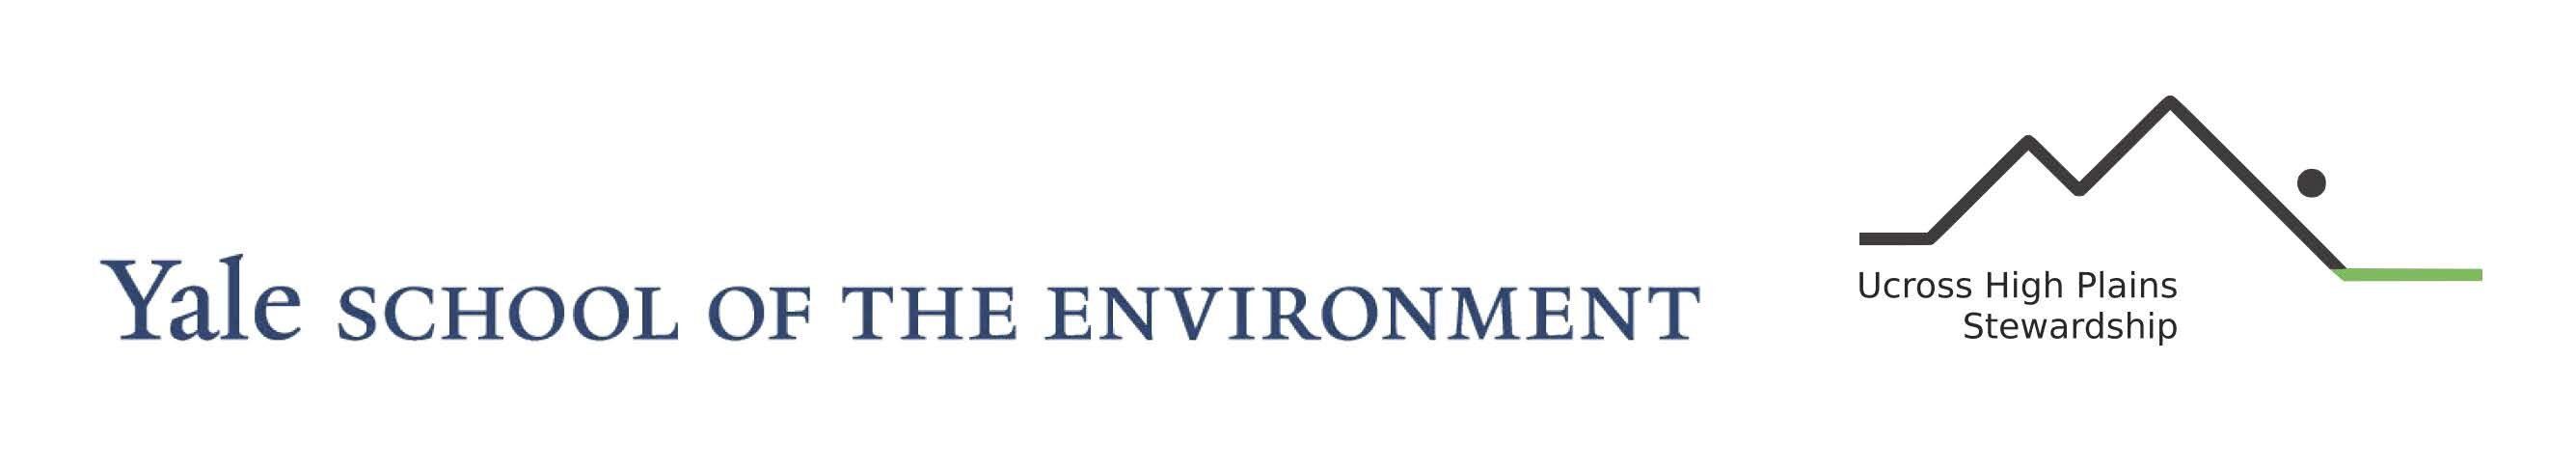 Ucross High Plains Stewardship Initiative @Yale F&ES